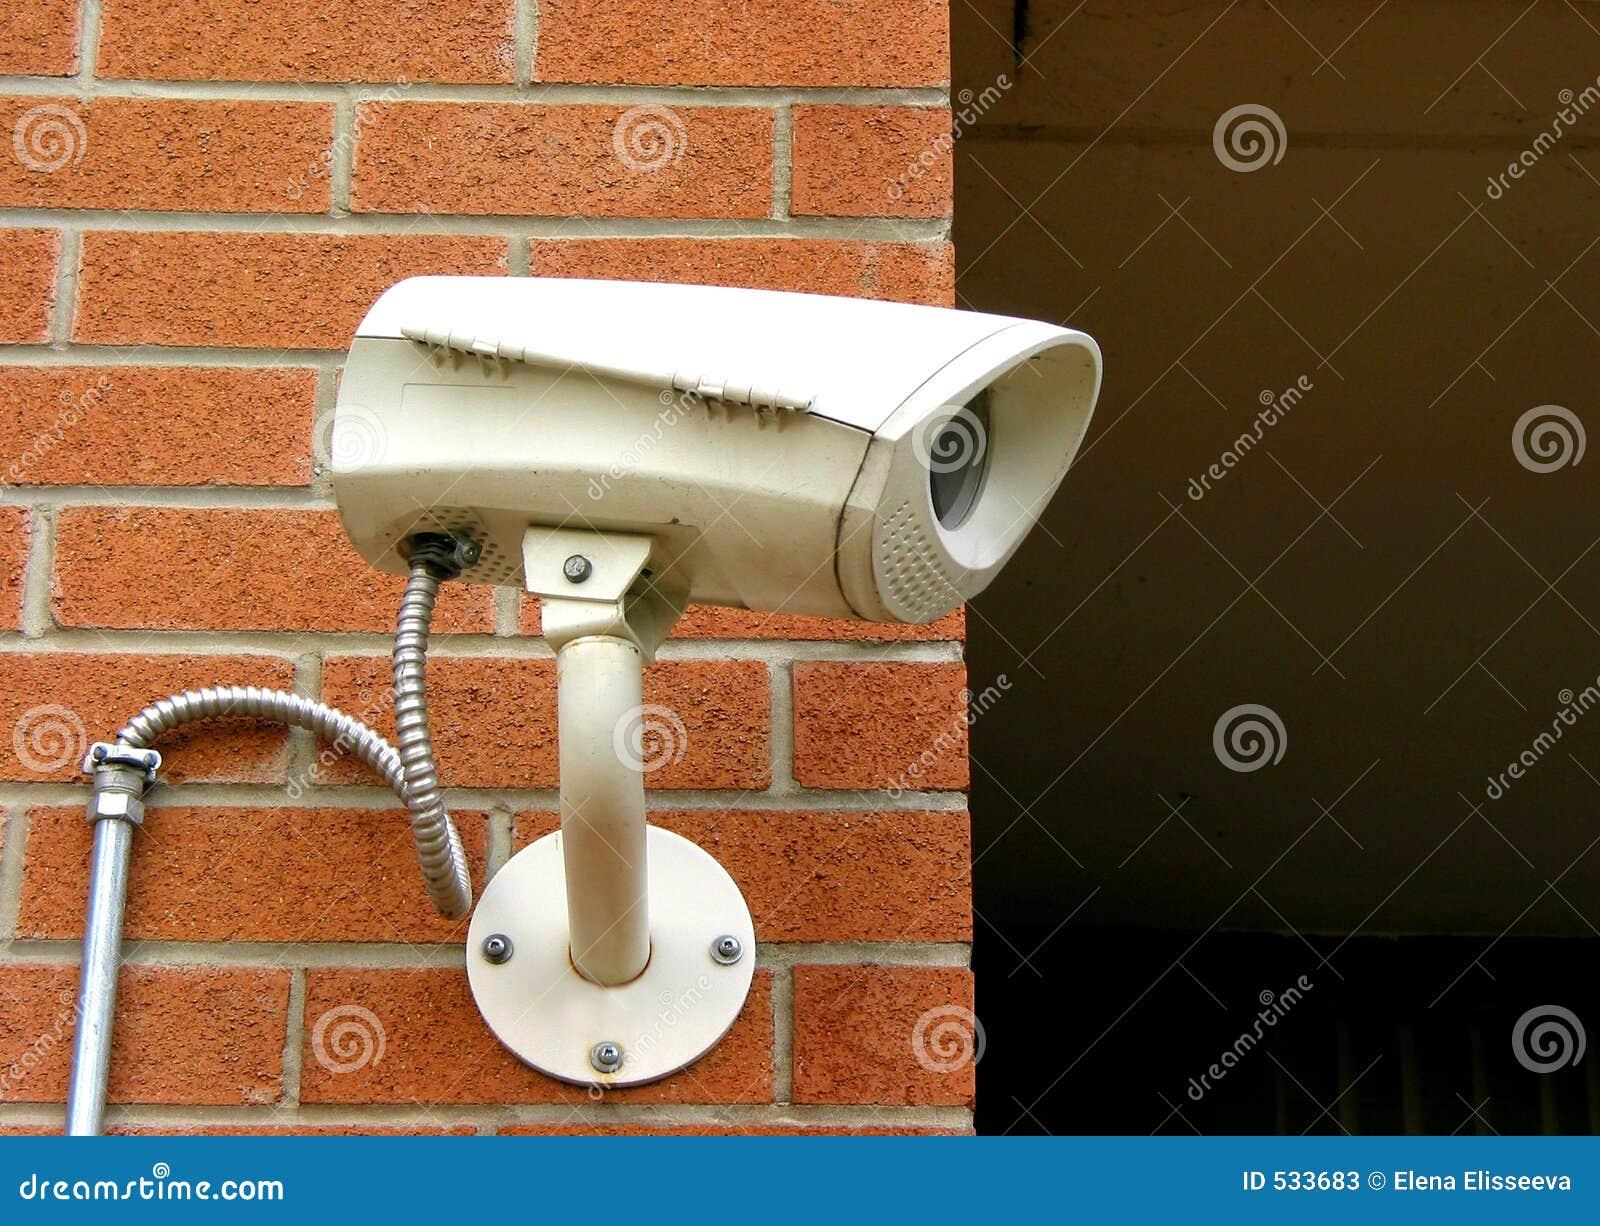 Download 1照相机证券 库存图片. 图片 包括有 卫兵, 墙壁, 照相机, 电路, 住宅, 空白, 监控, 录影, 监视 - 533683